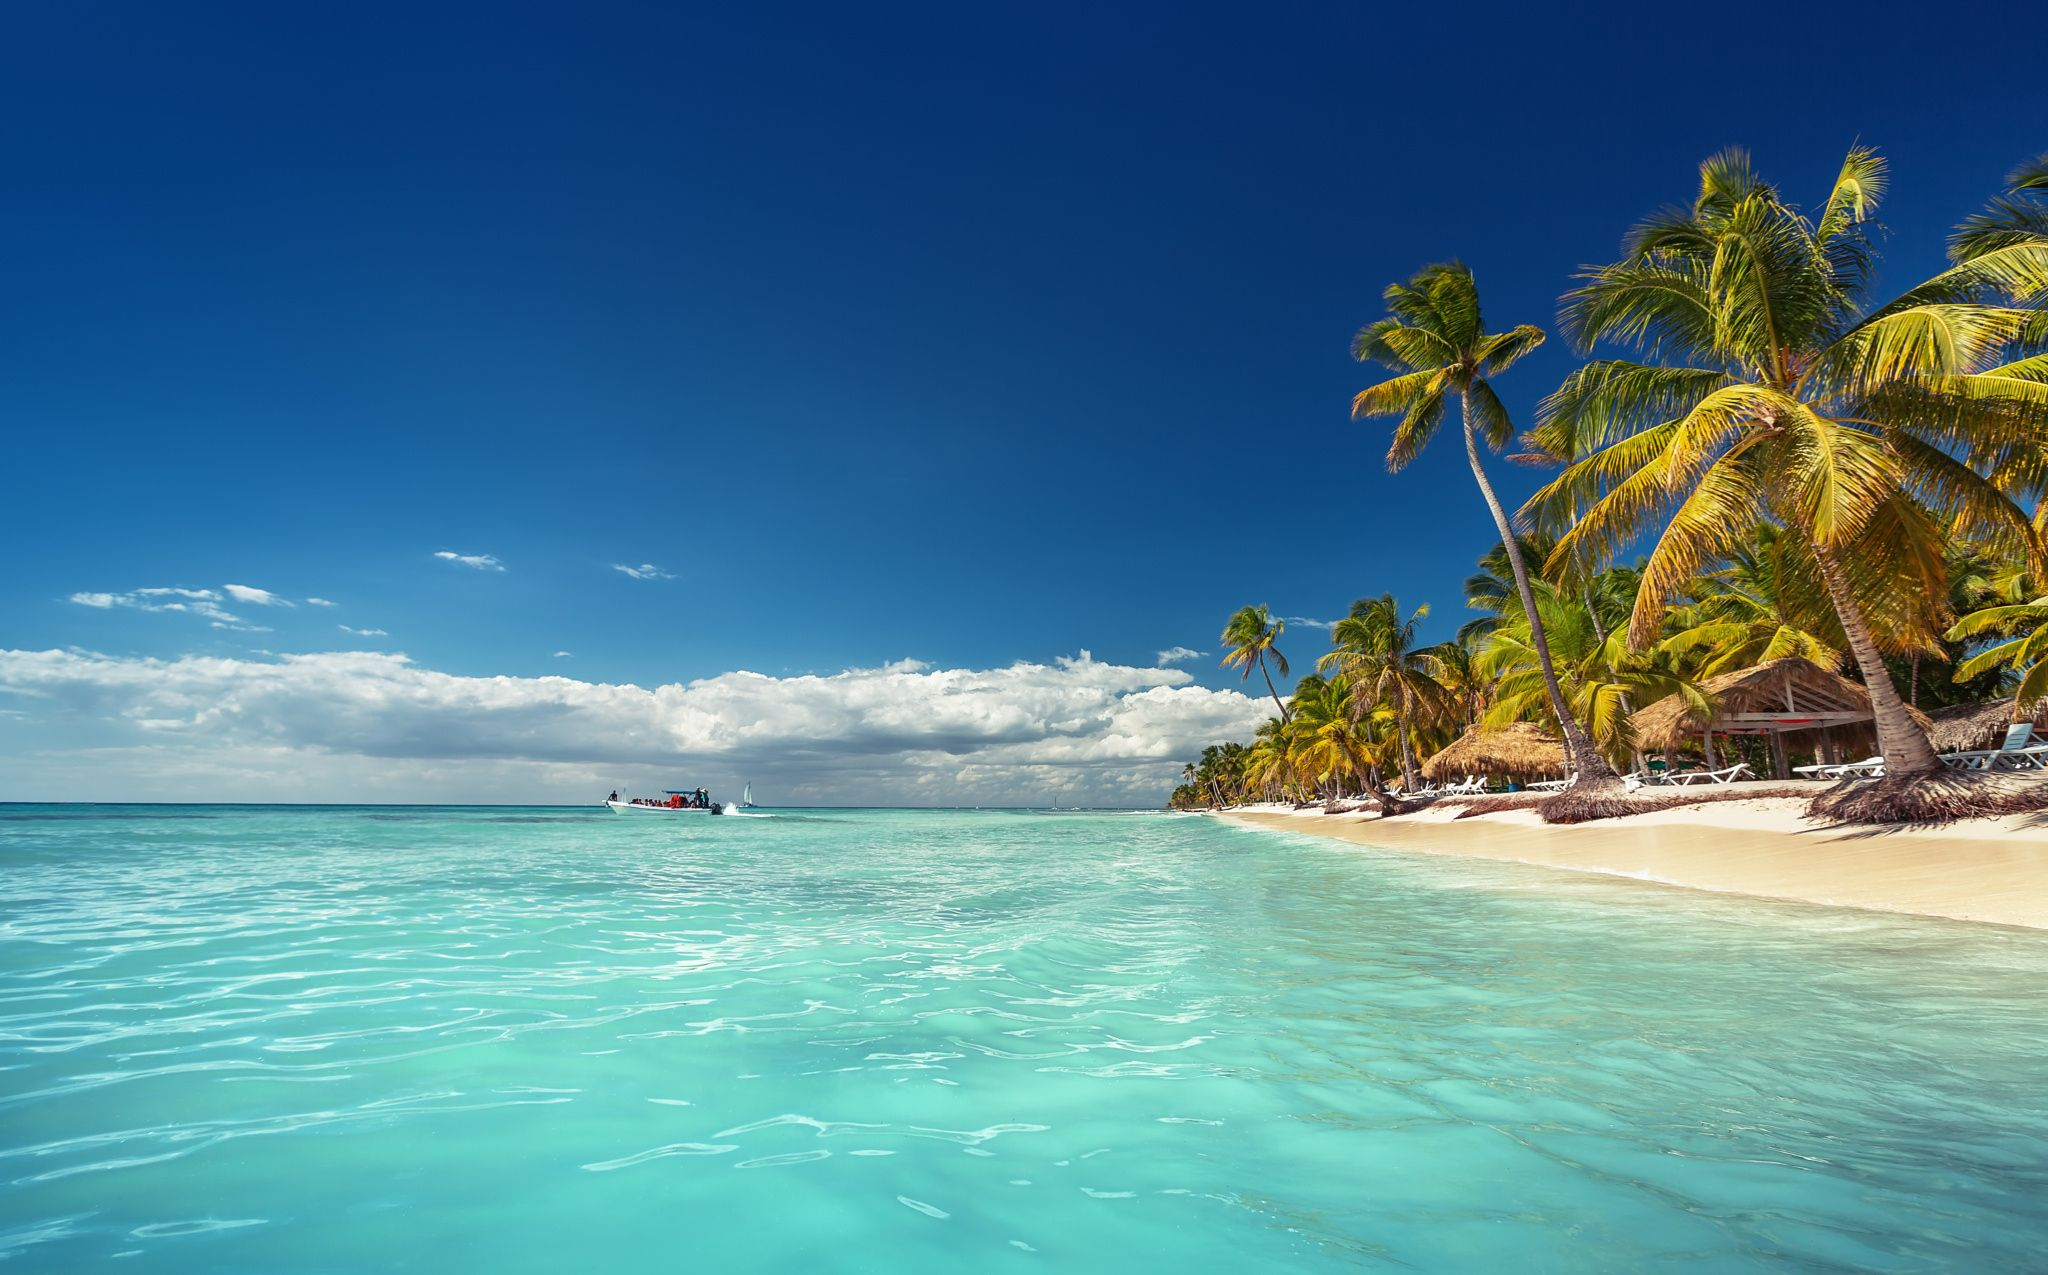 Landscape Of Paradise Tropical Island Beach Tropical Island Beach Carribean Travel Punta Cana Pictures